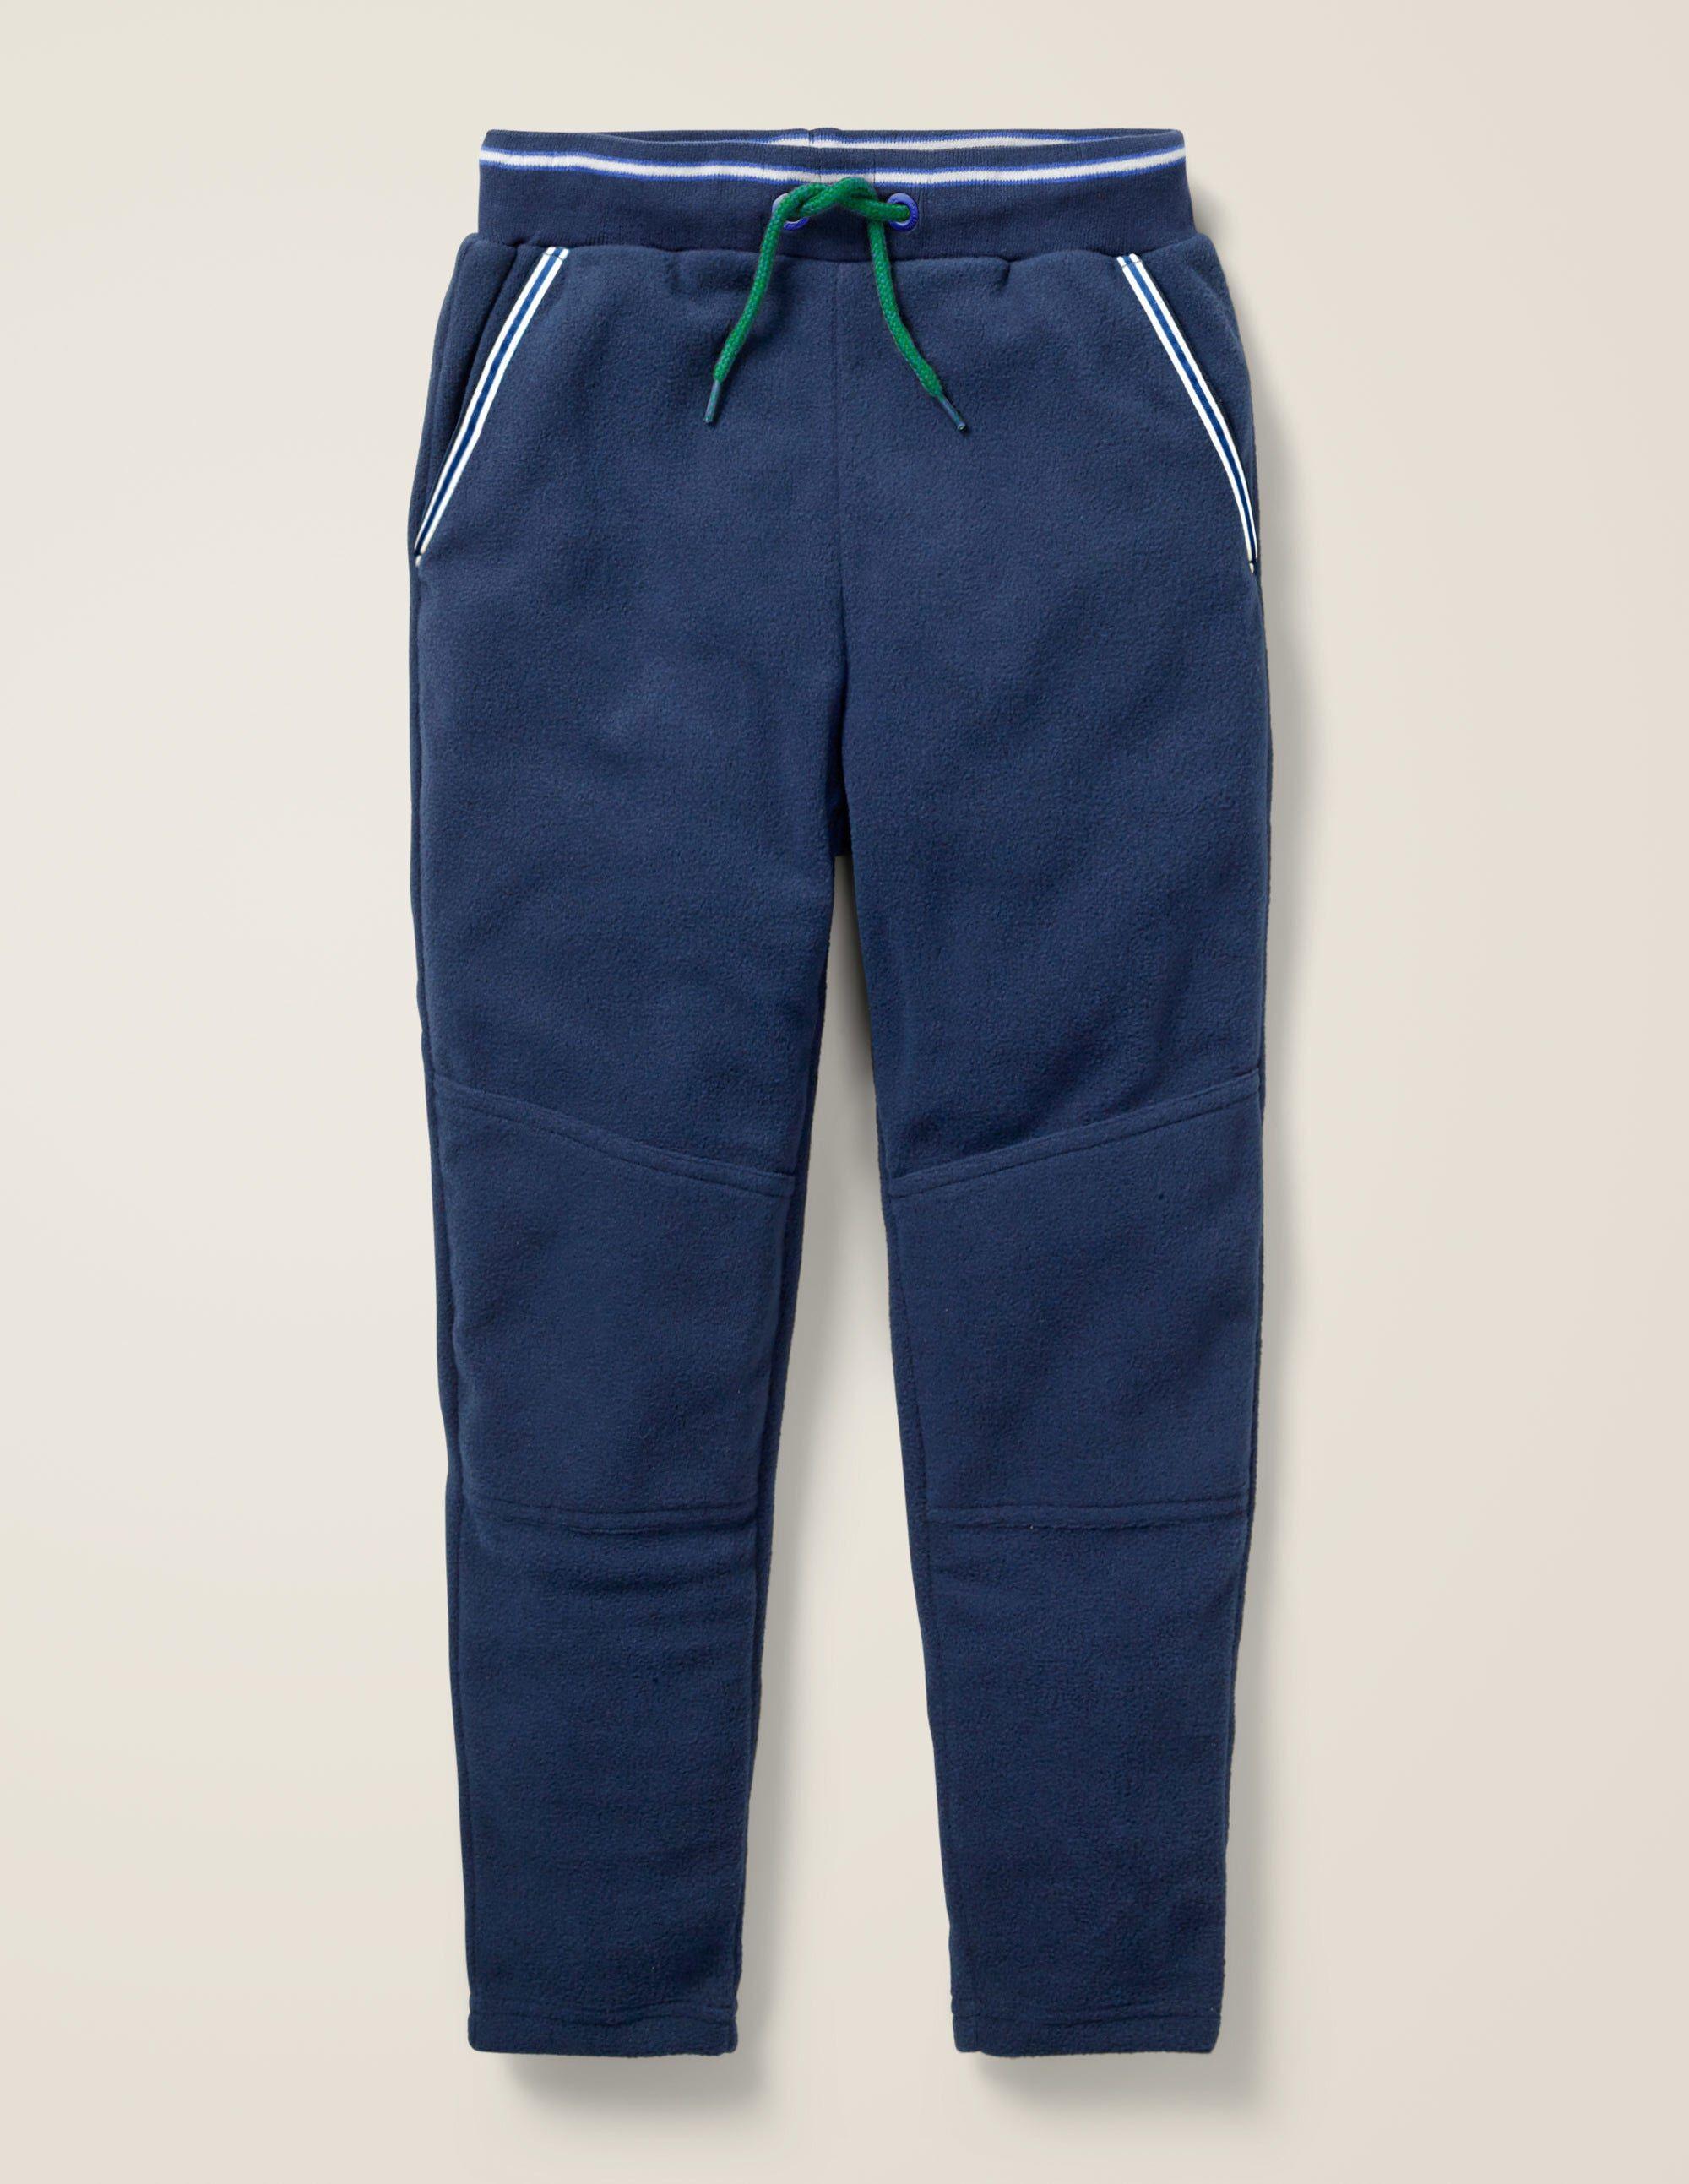 Mini Pantalon de survêtement en micro-polaire BLU Garçon Boden, Blue - 11a